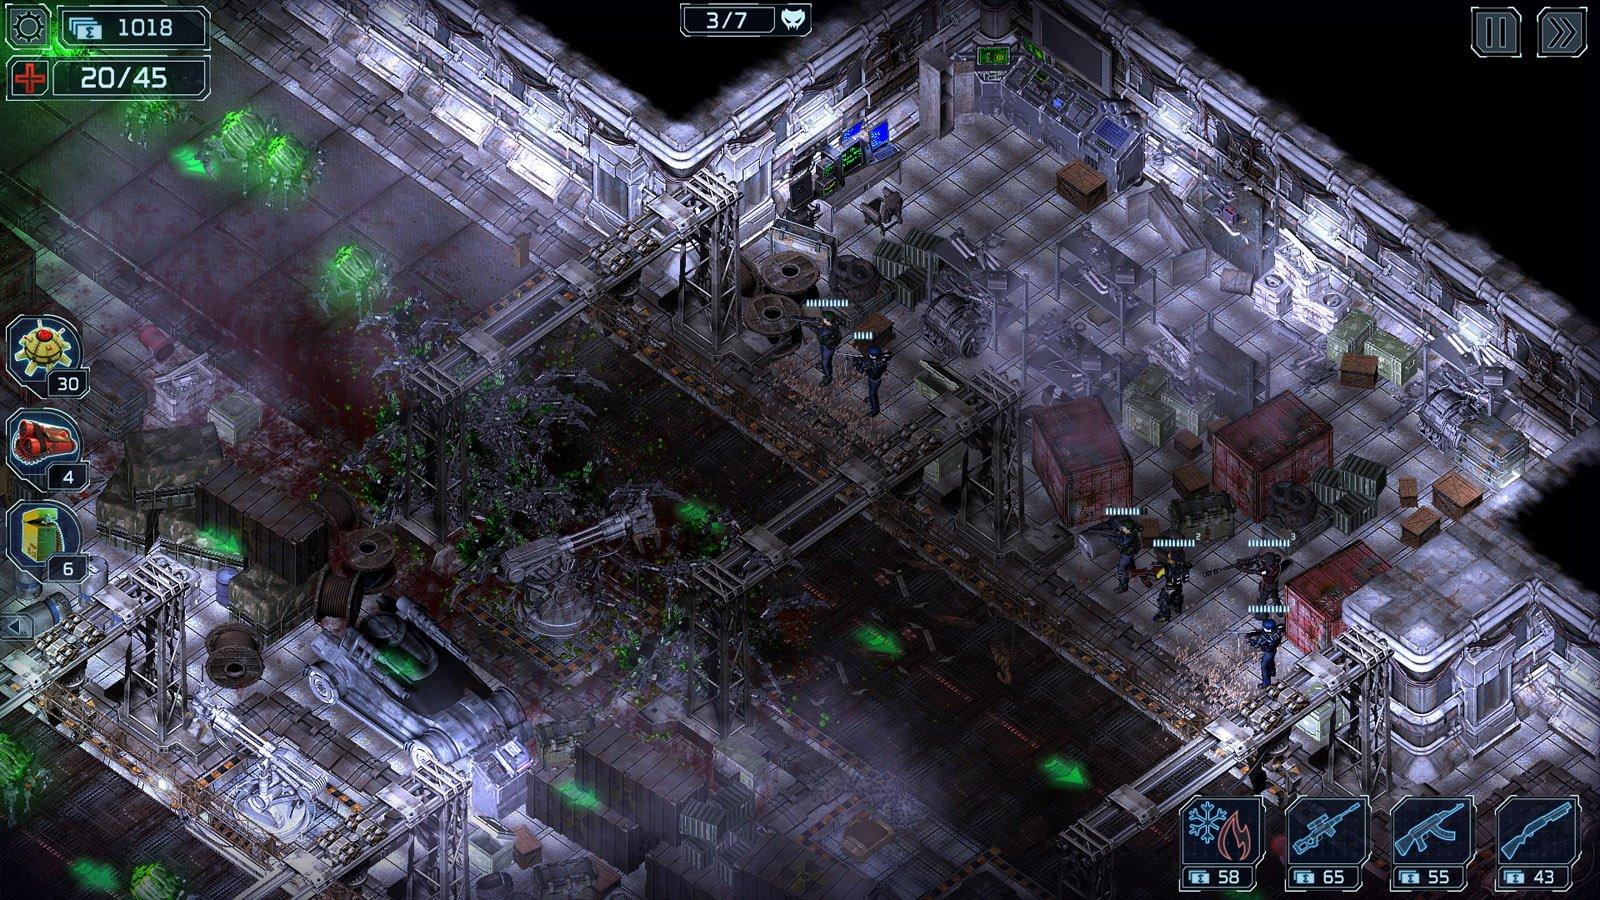 Скриншот Alien Shooter TD v1.0.8 (2017) PC